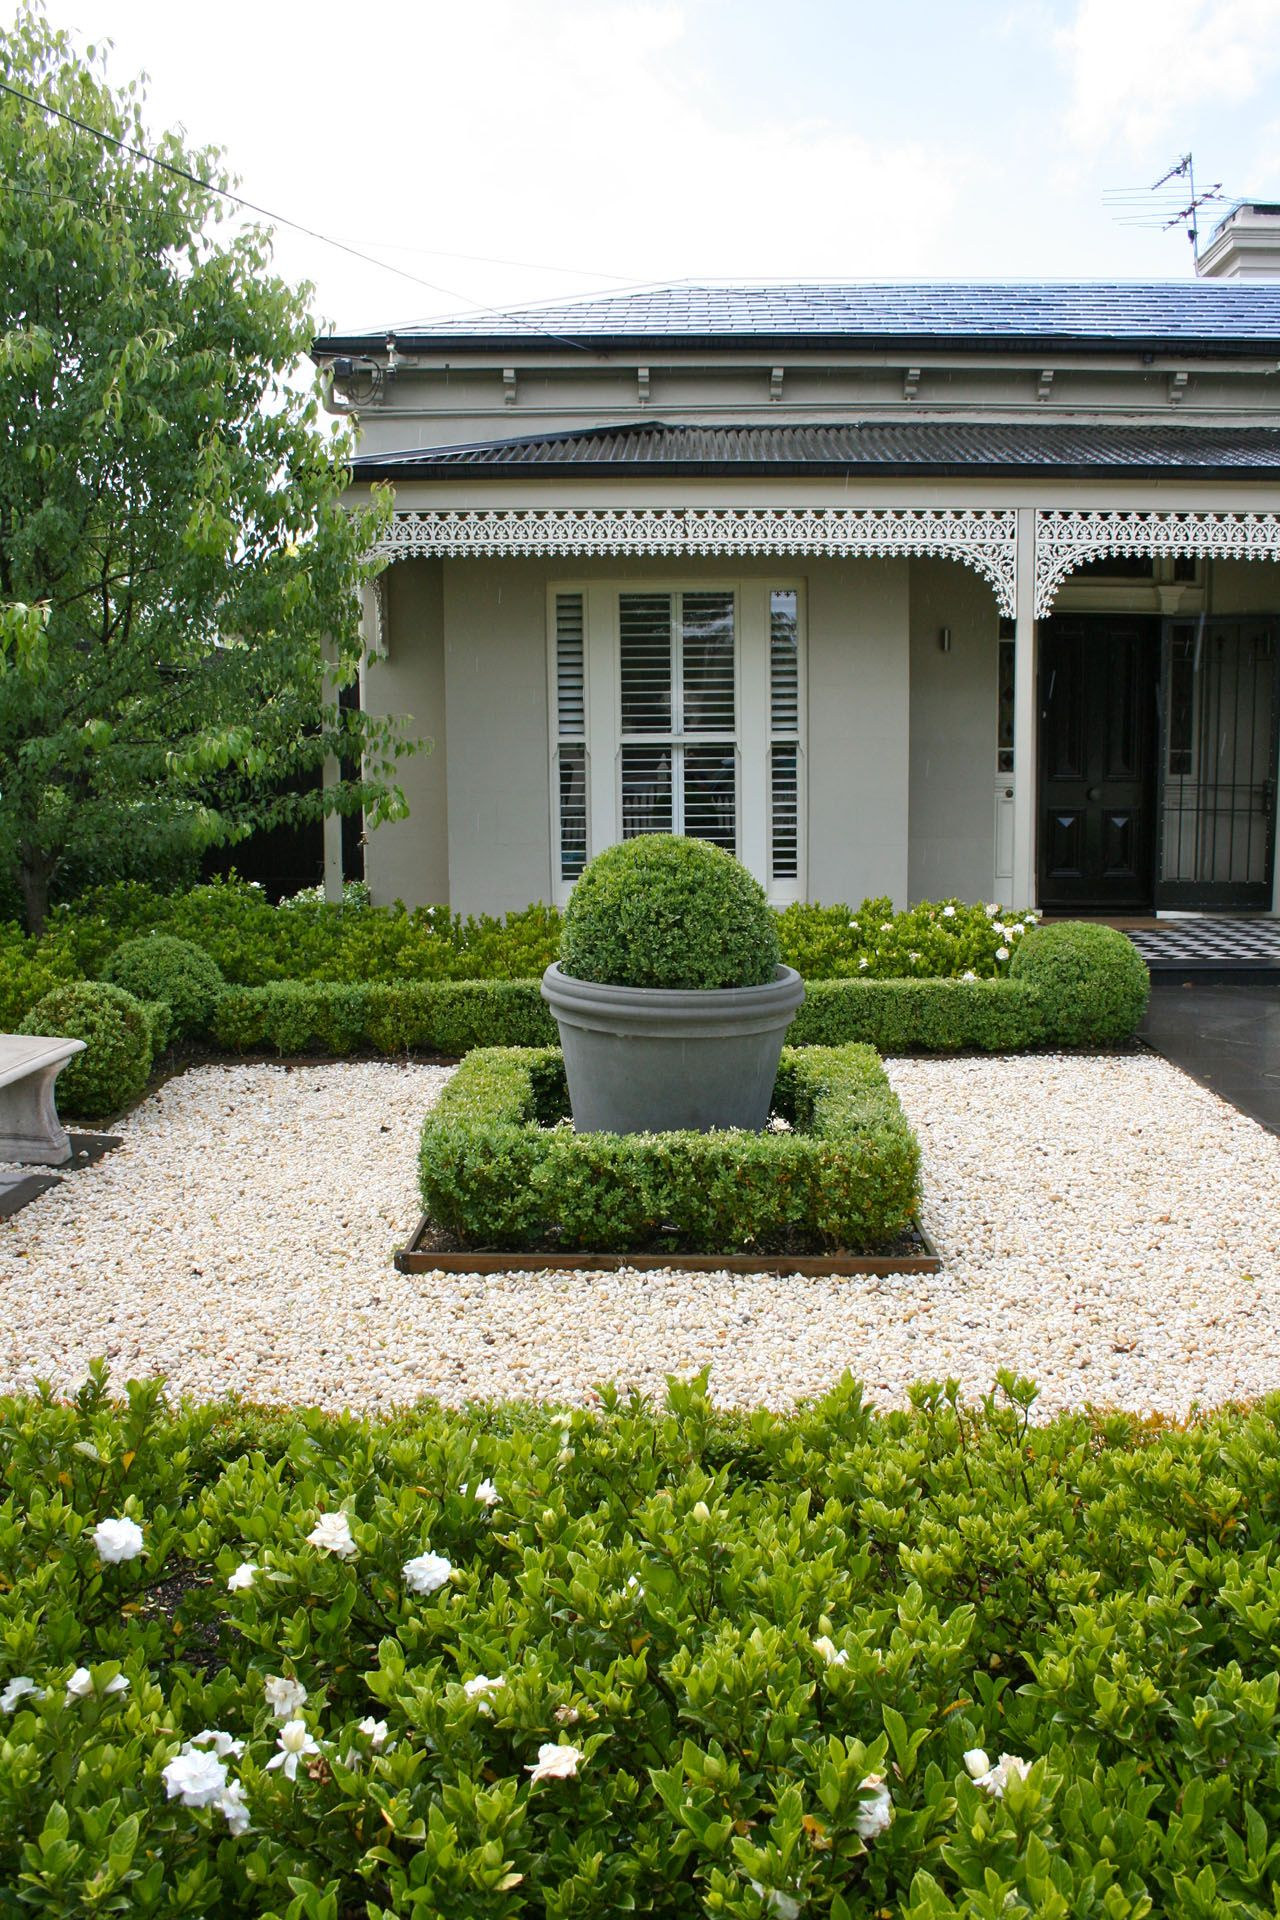 andrew stark more garten pinterest vorgarten g rten. Black Bedroom Furniture Sets. Home Design Ideas